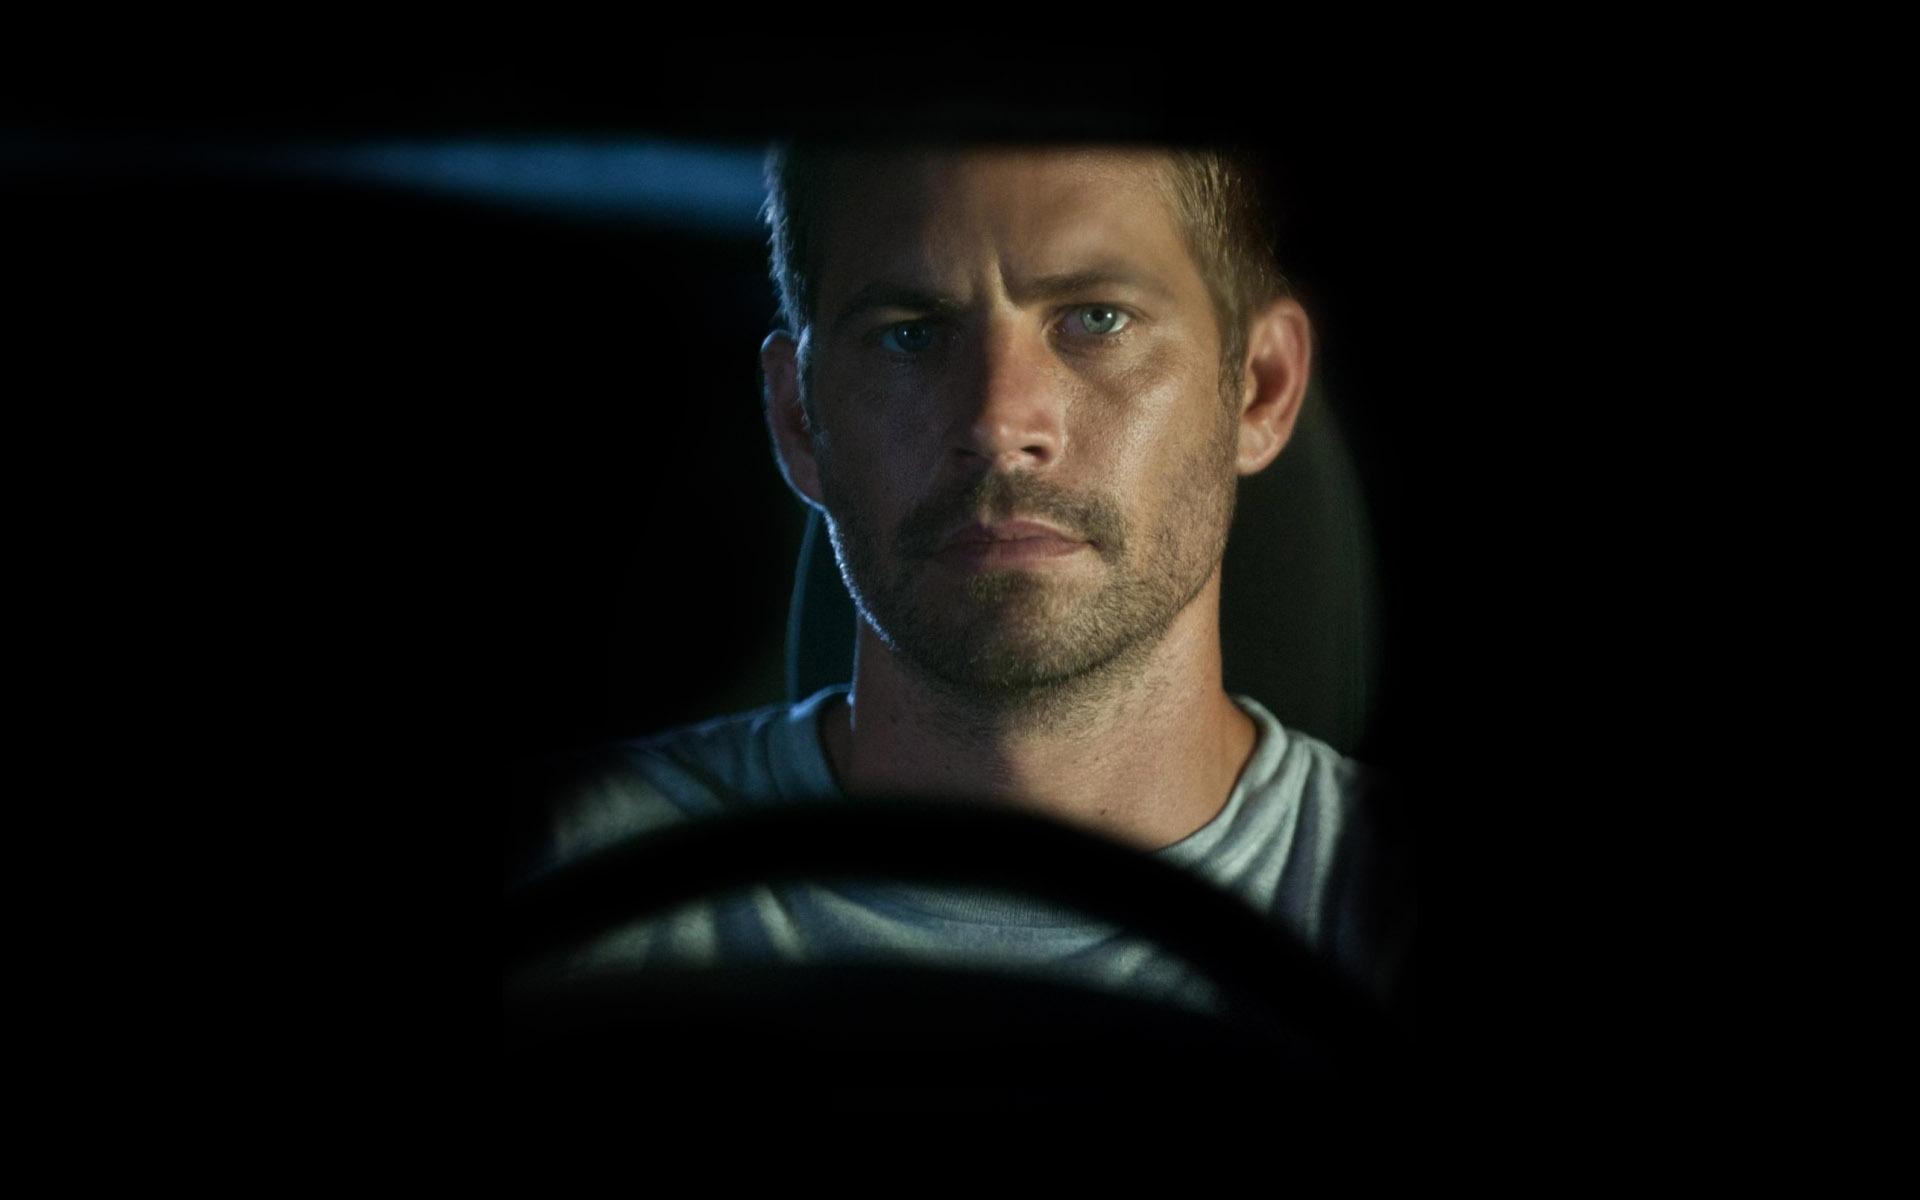 Paul Walker Man Actor View Fast And Furious Wallpaper